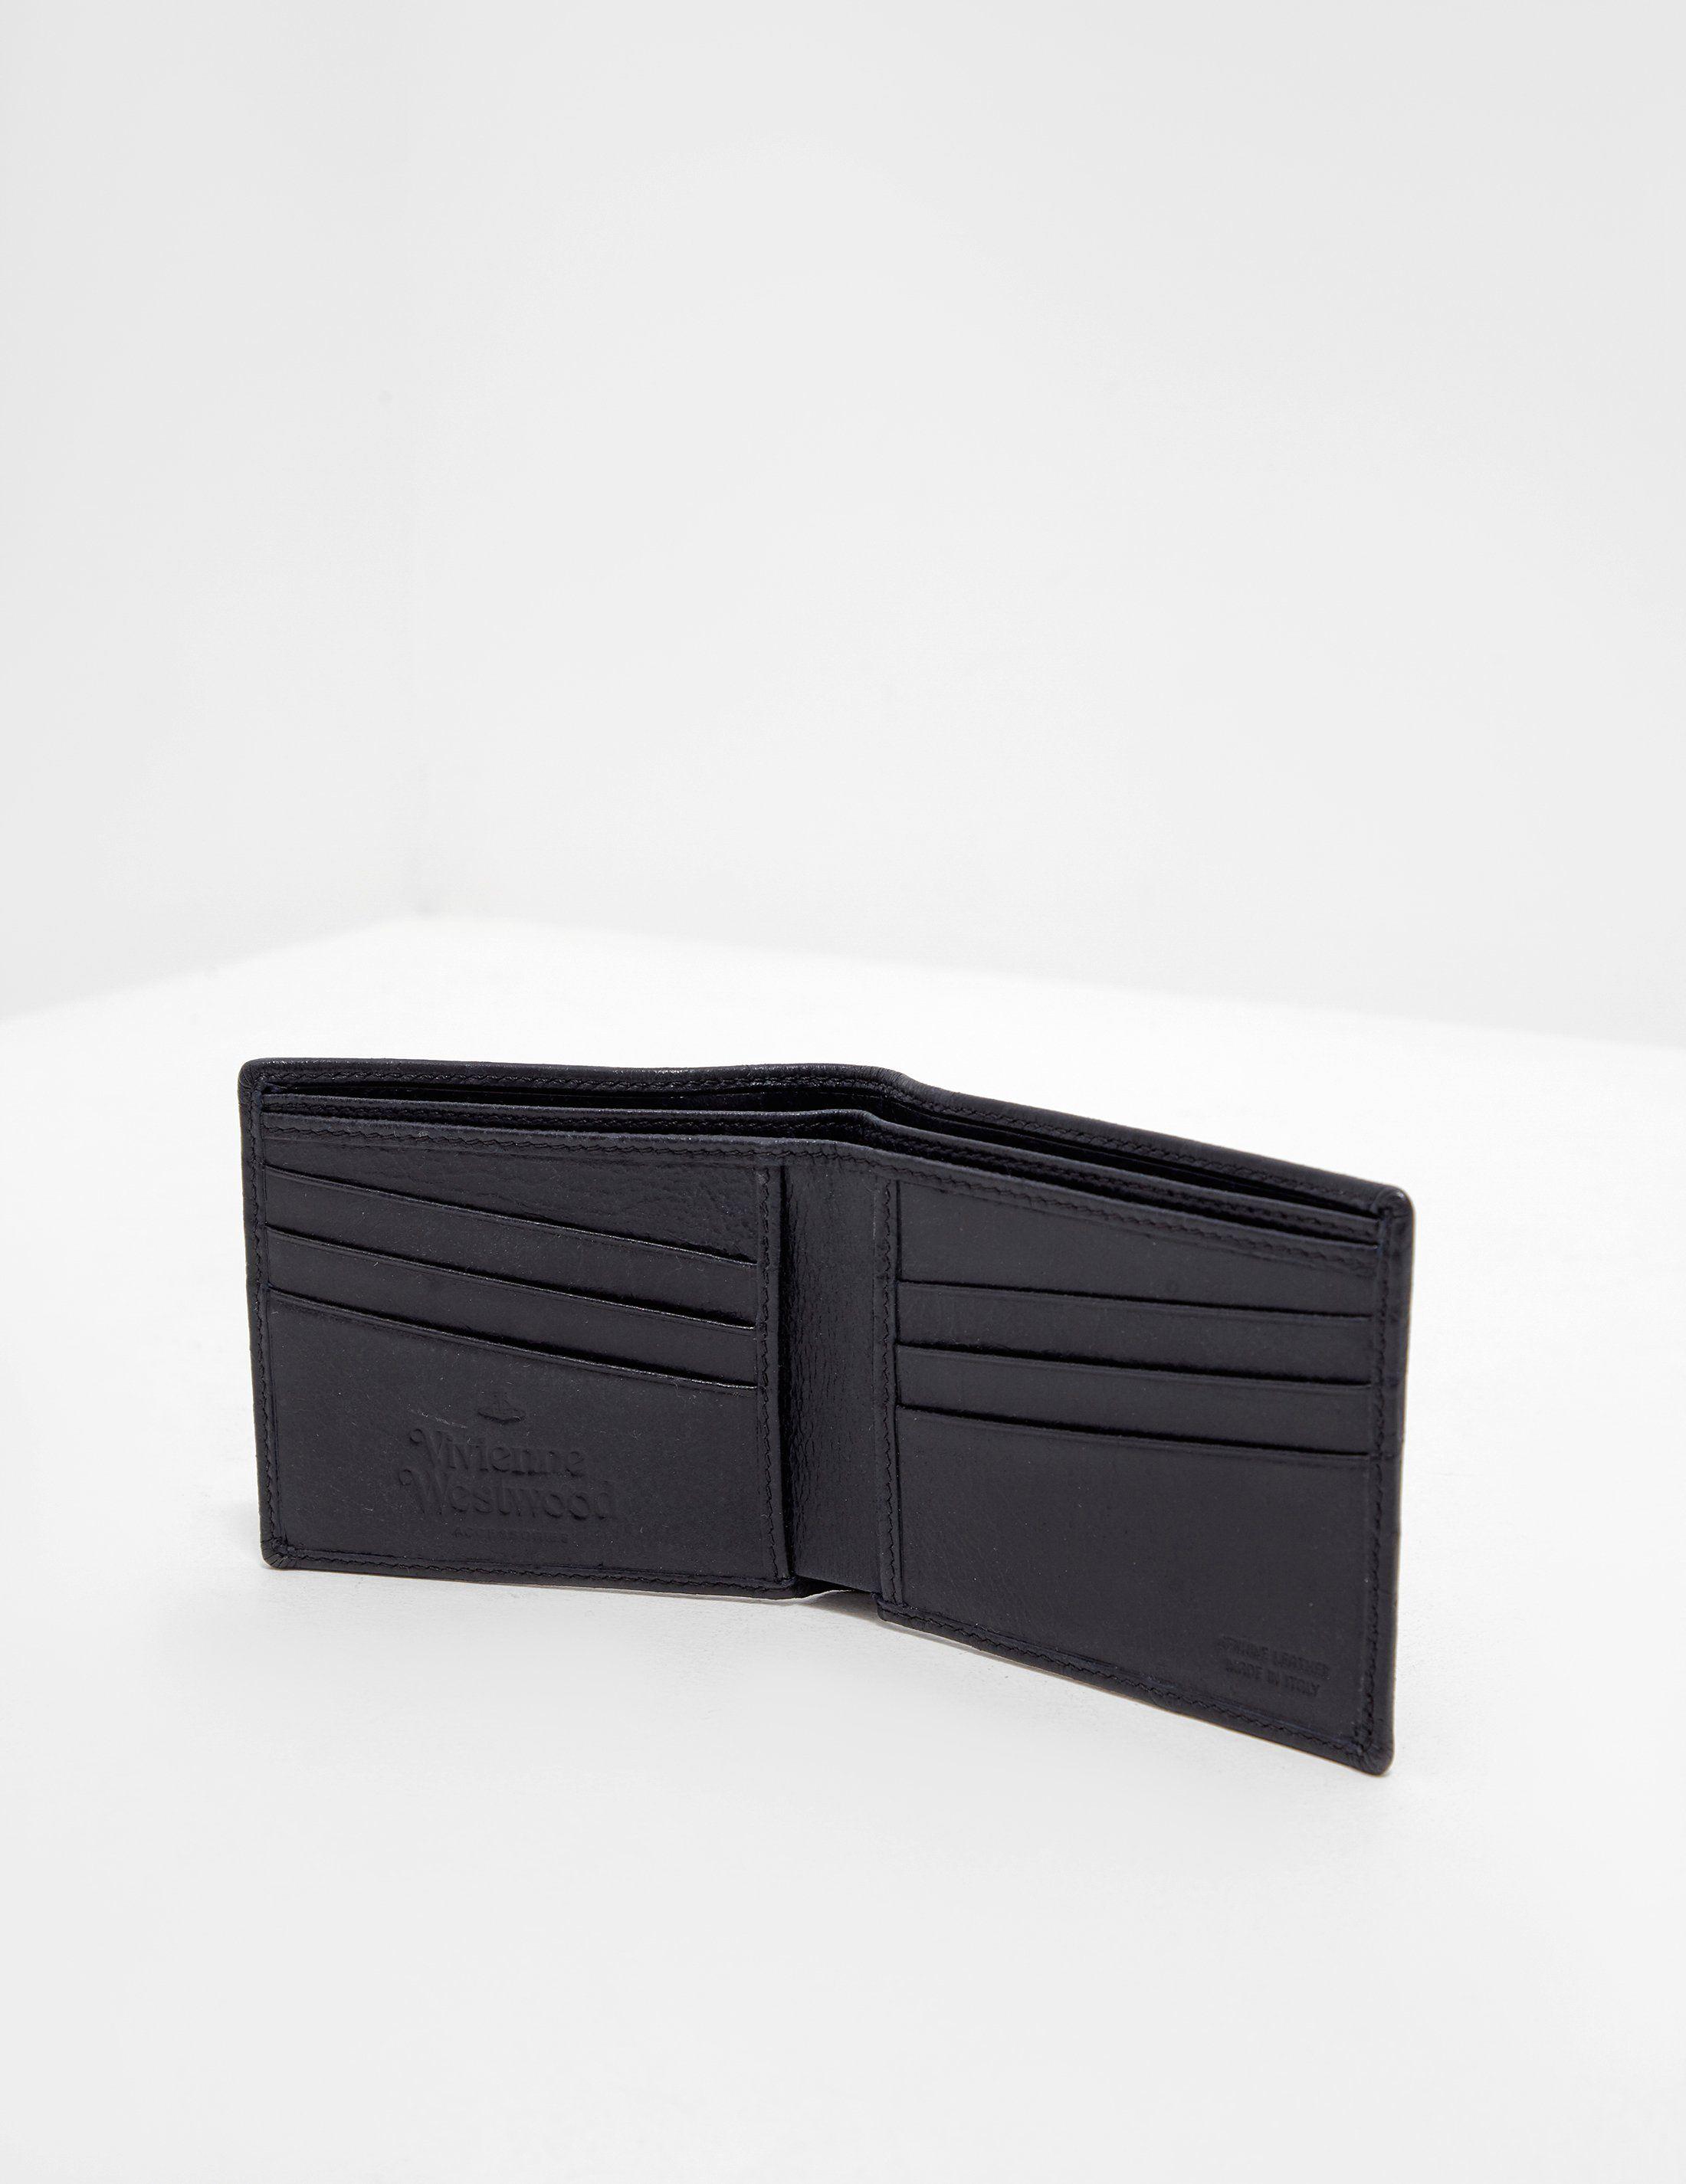 Vivienne Westwood Belfast Wallet